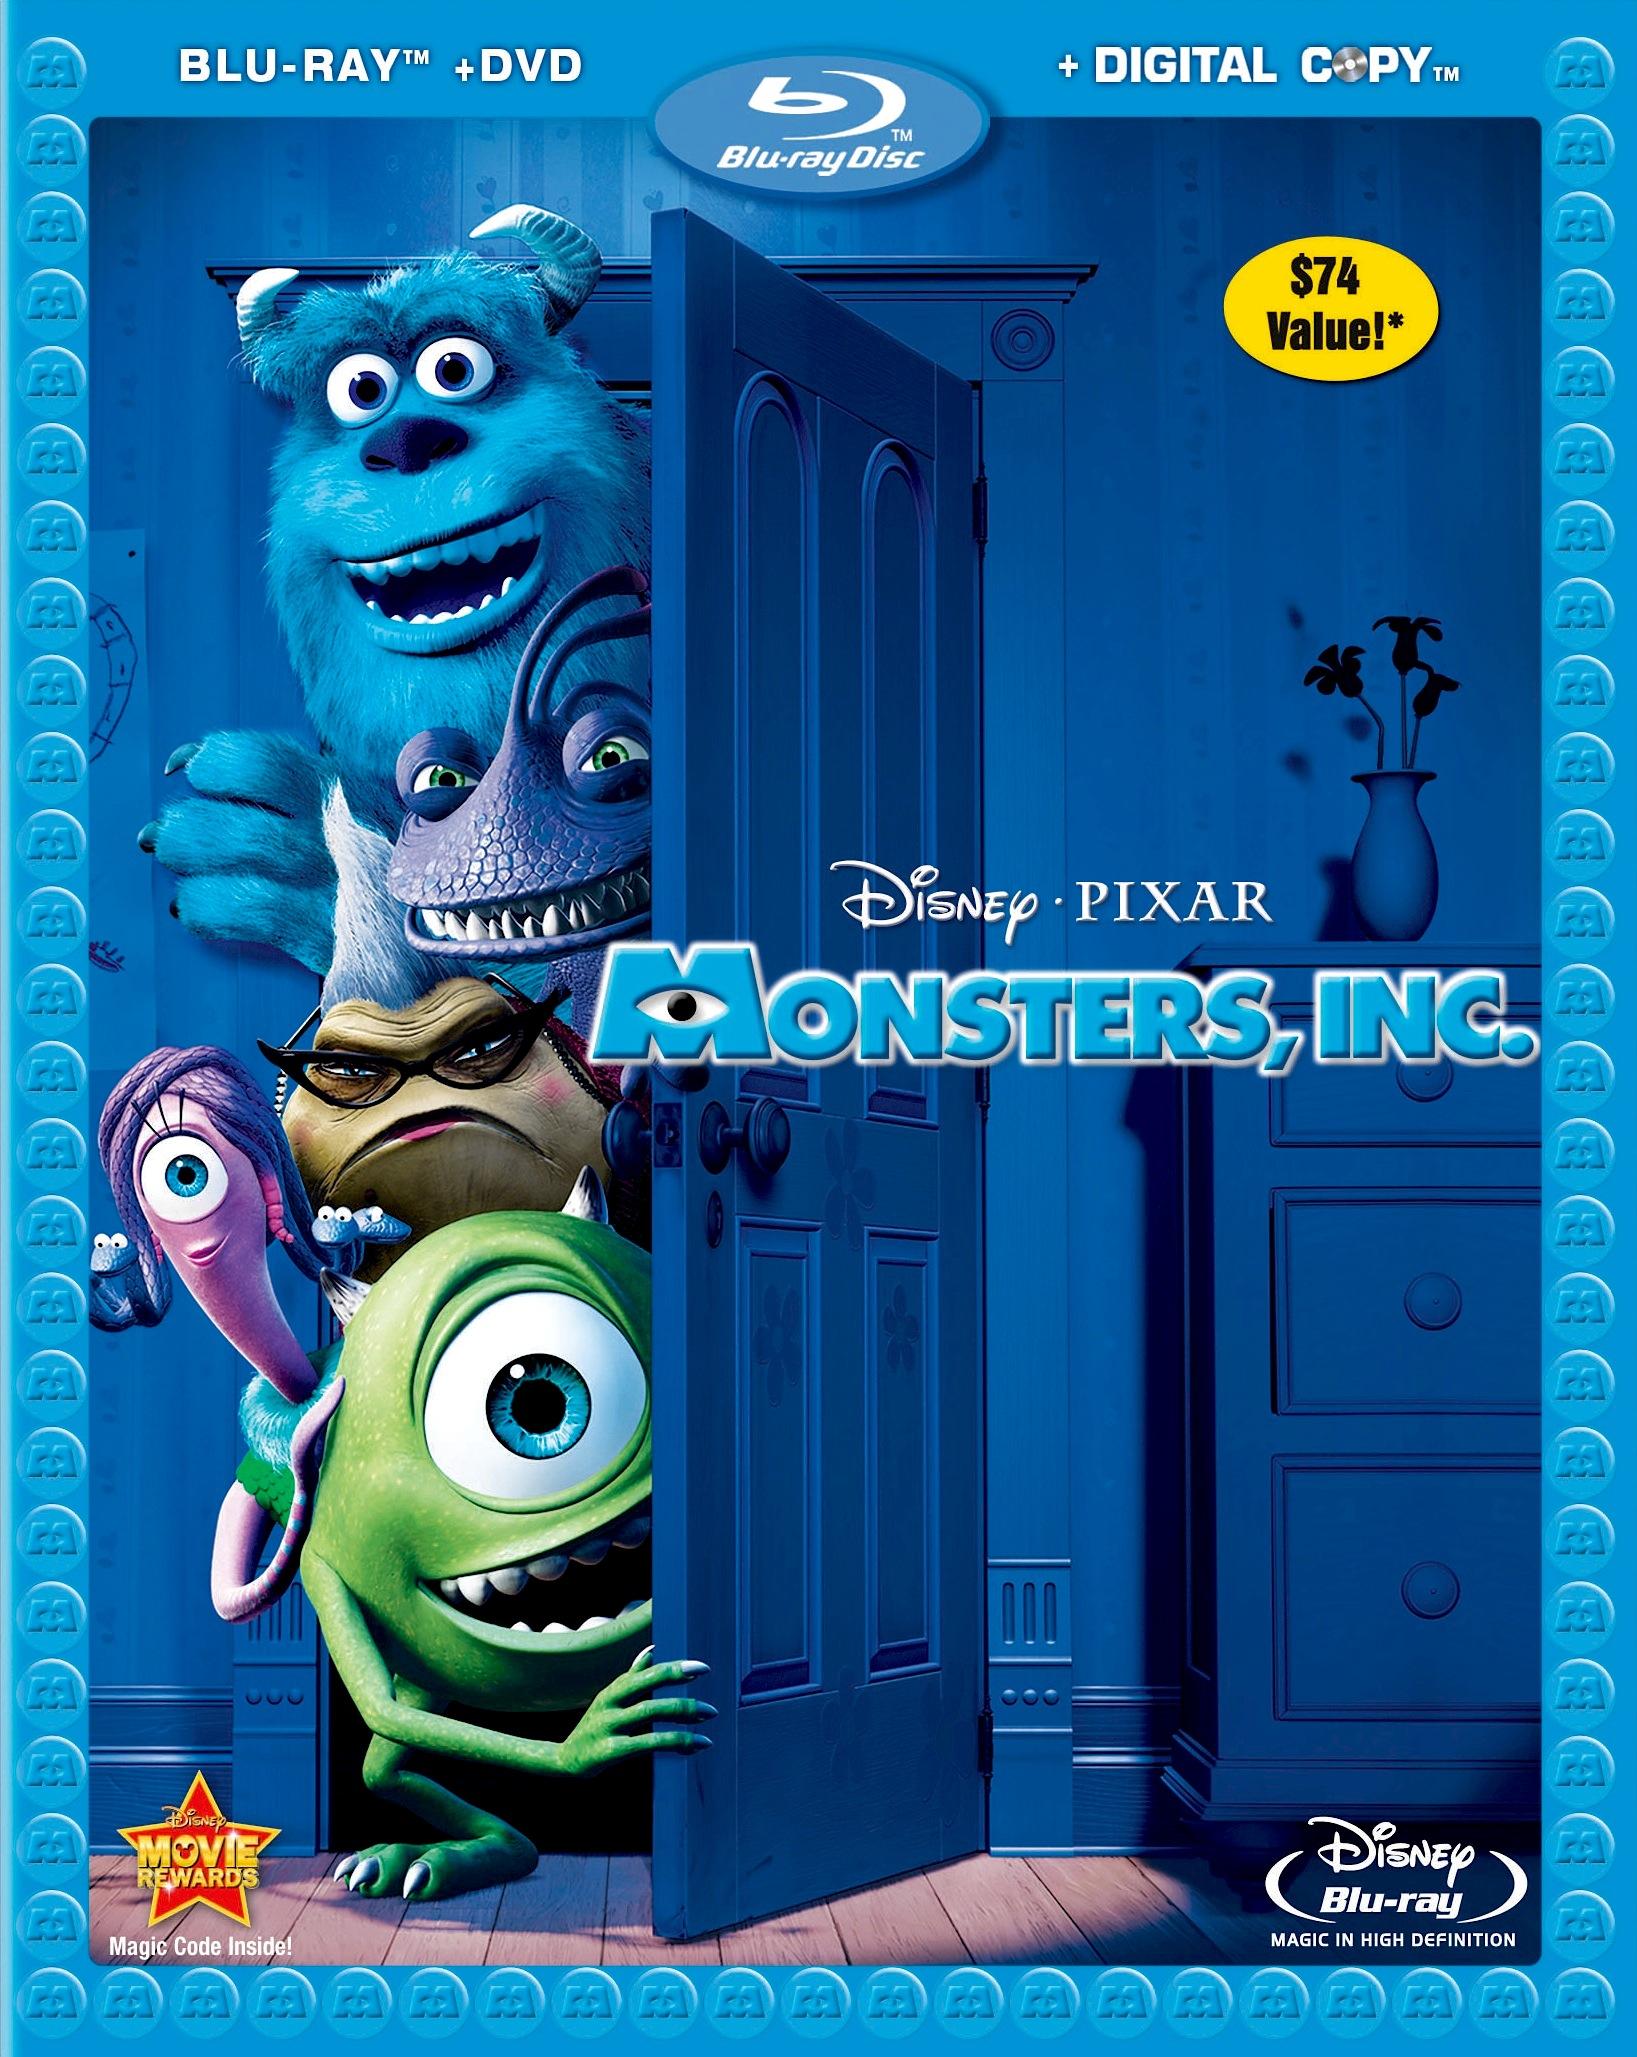 Monsters, Inc  Home Video | Pixar Wiki | FANDOM powered by Wikia